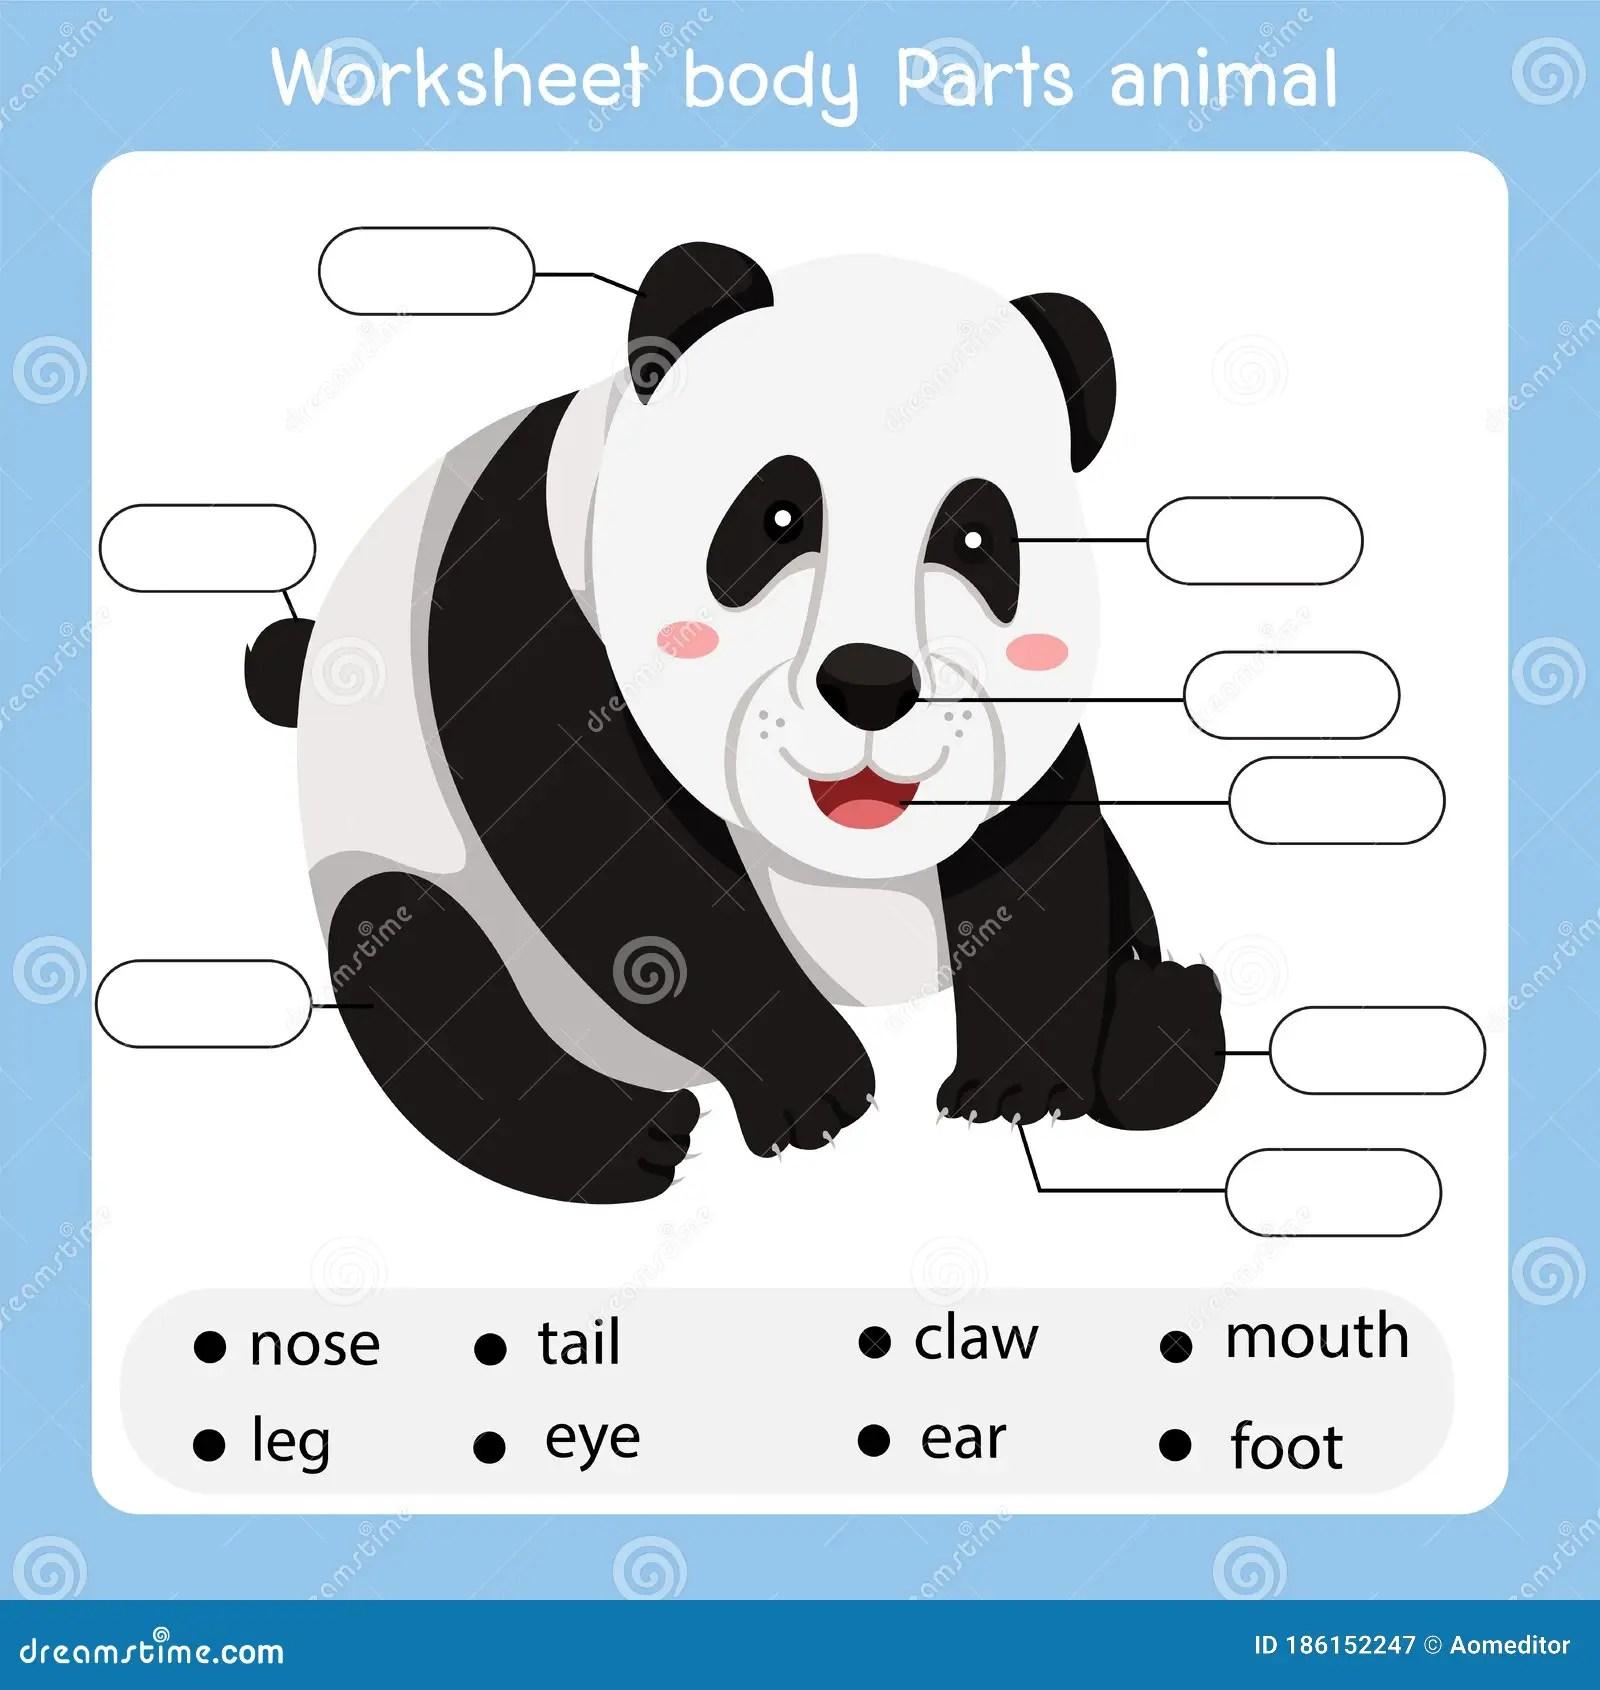 Illustrator Of Worksheet Body Parts Panda Animal Stock